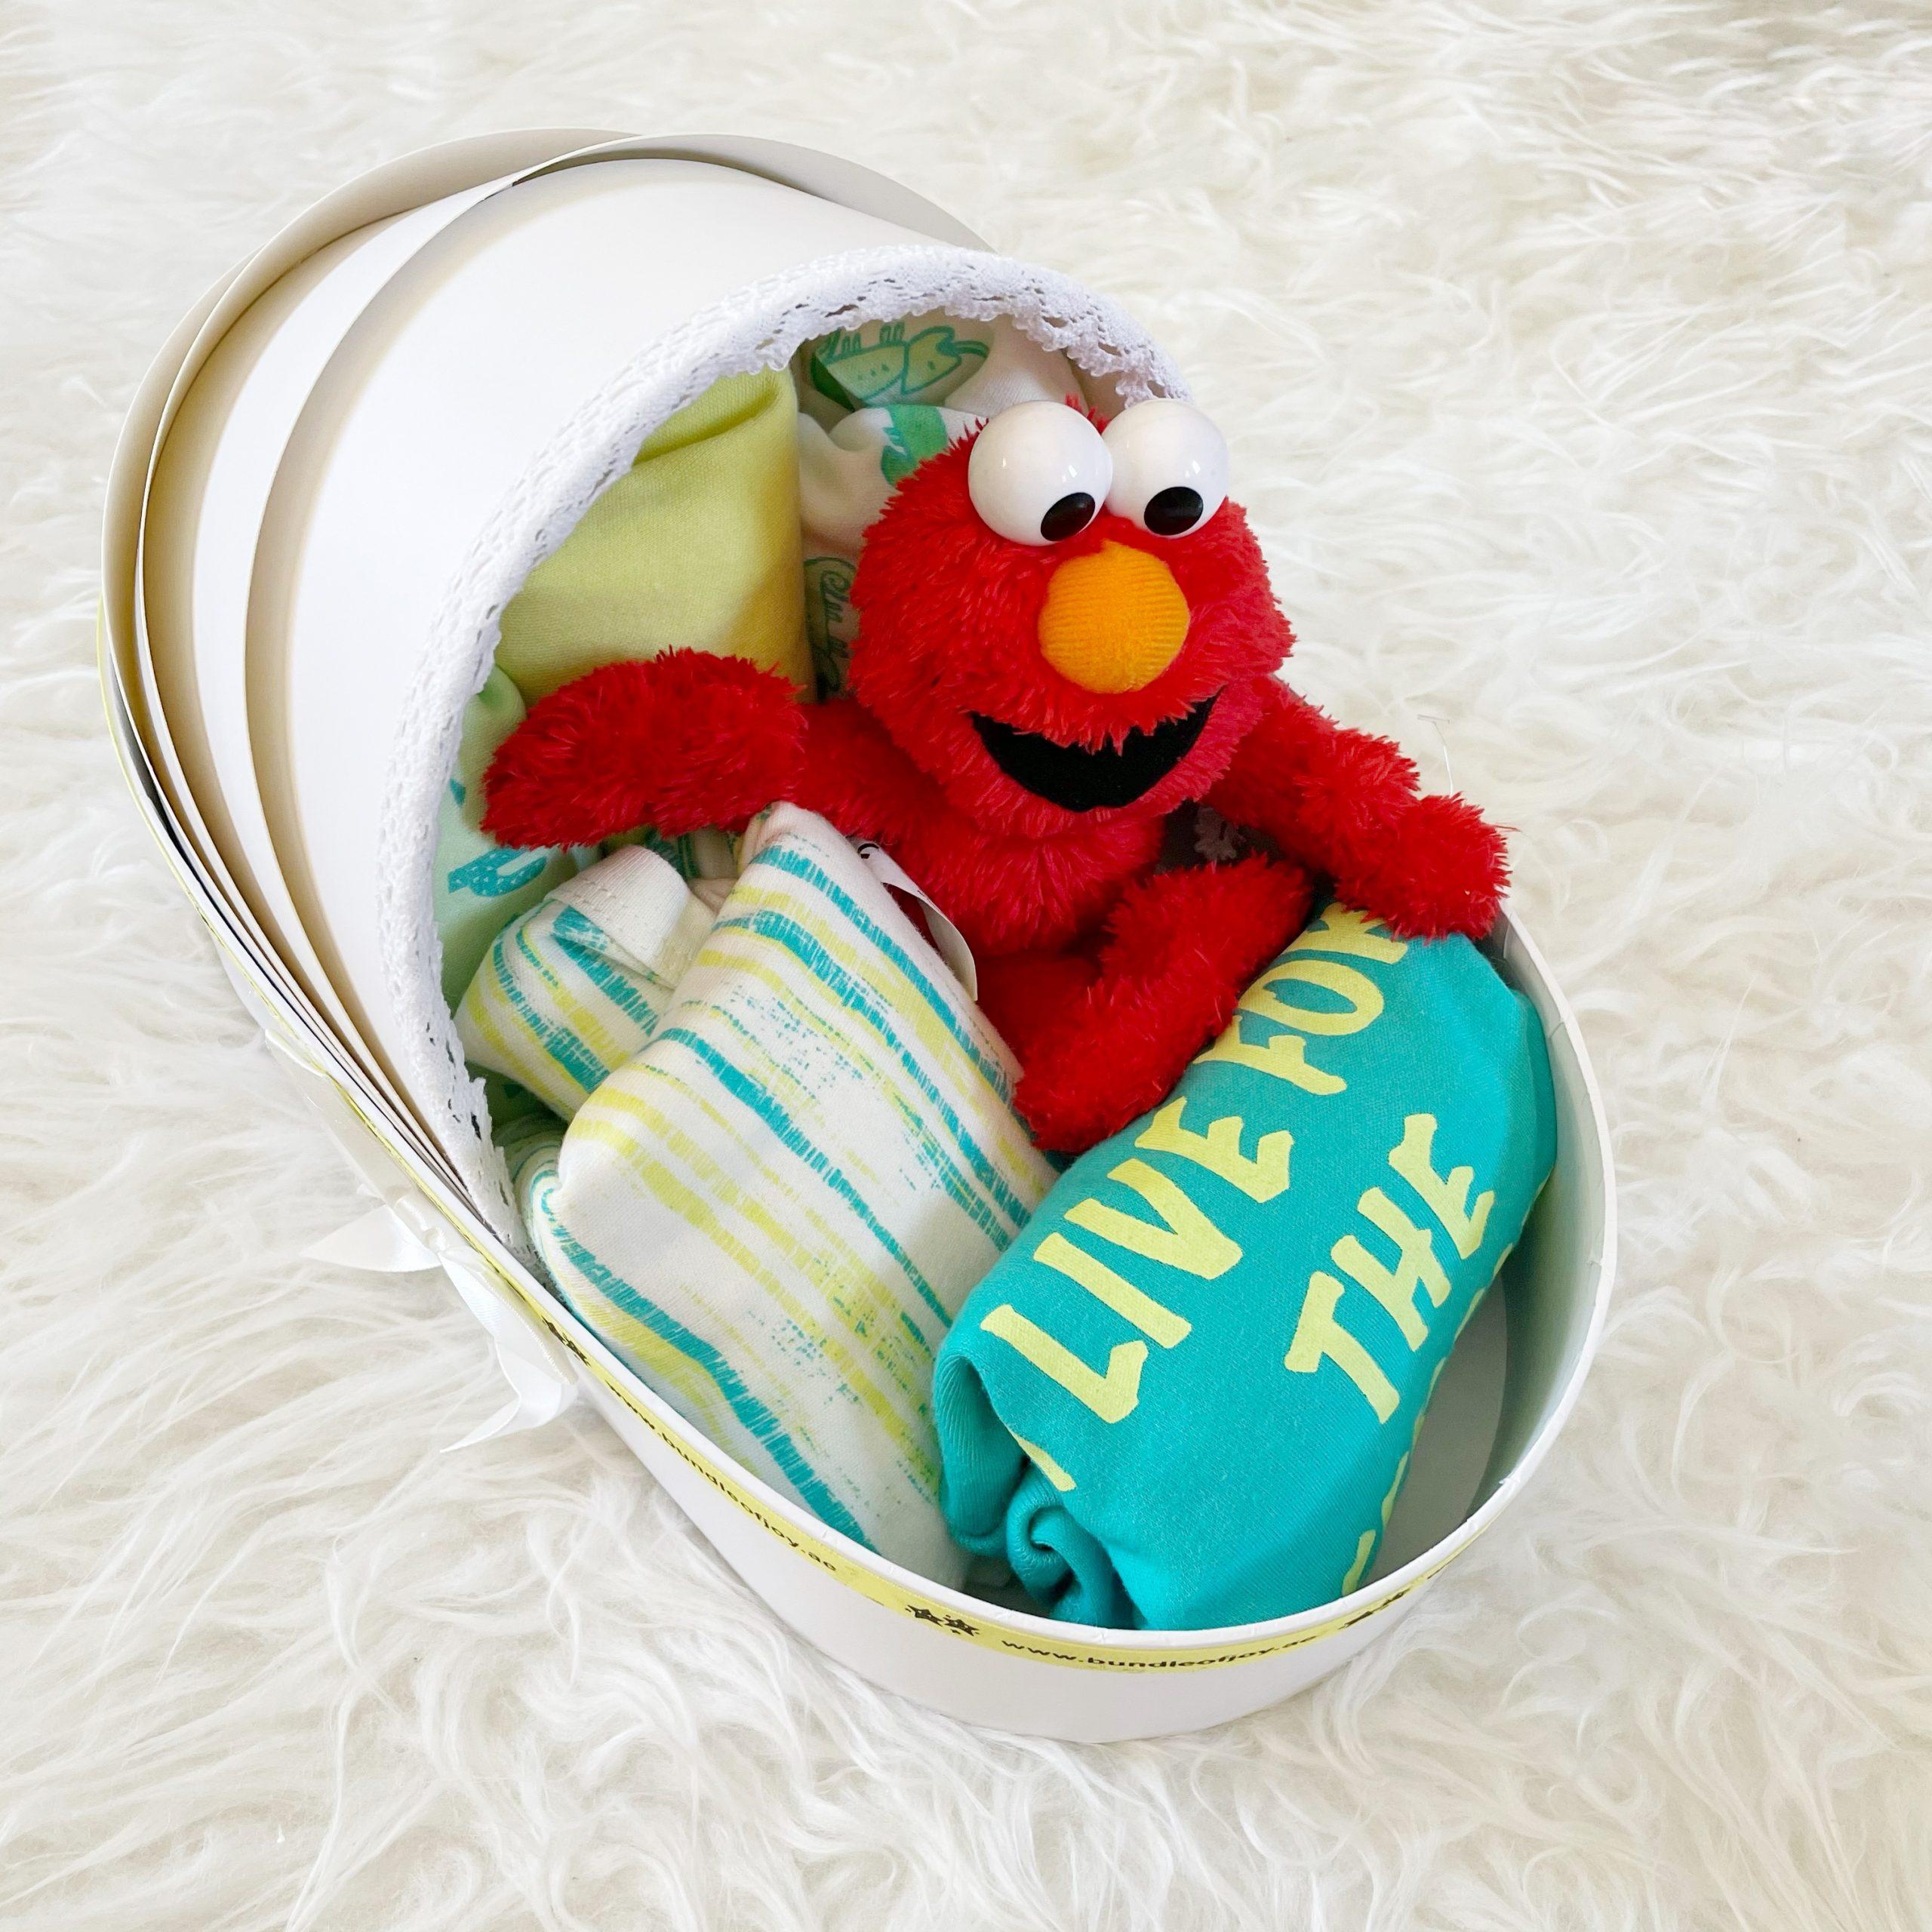 Elmo basket